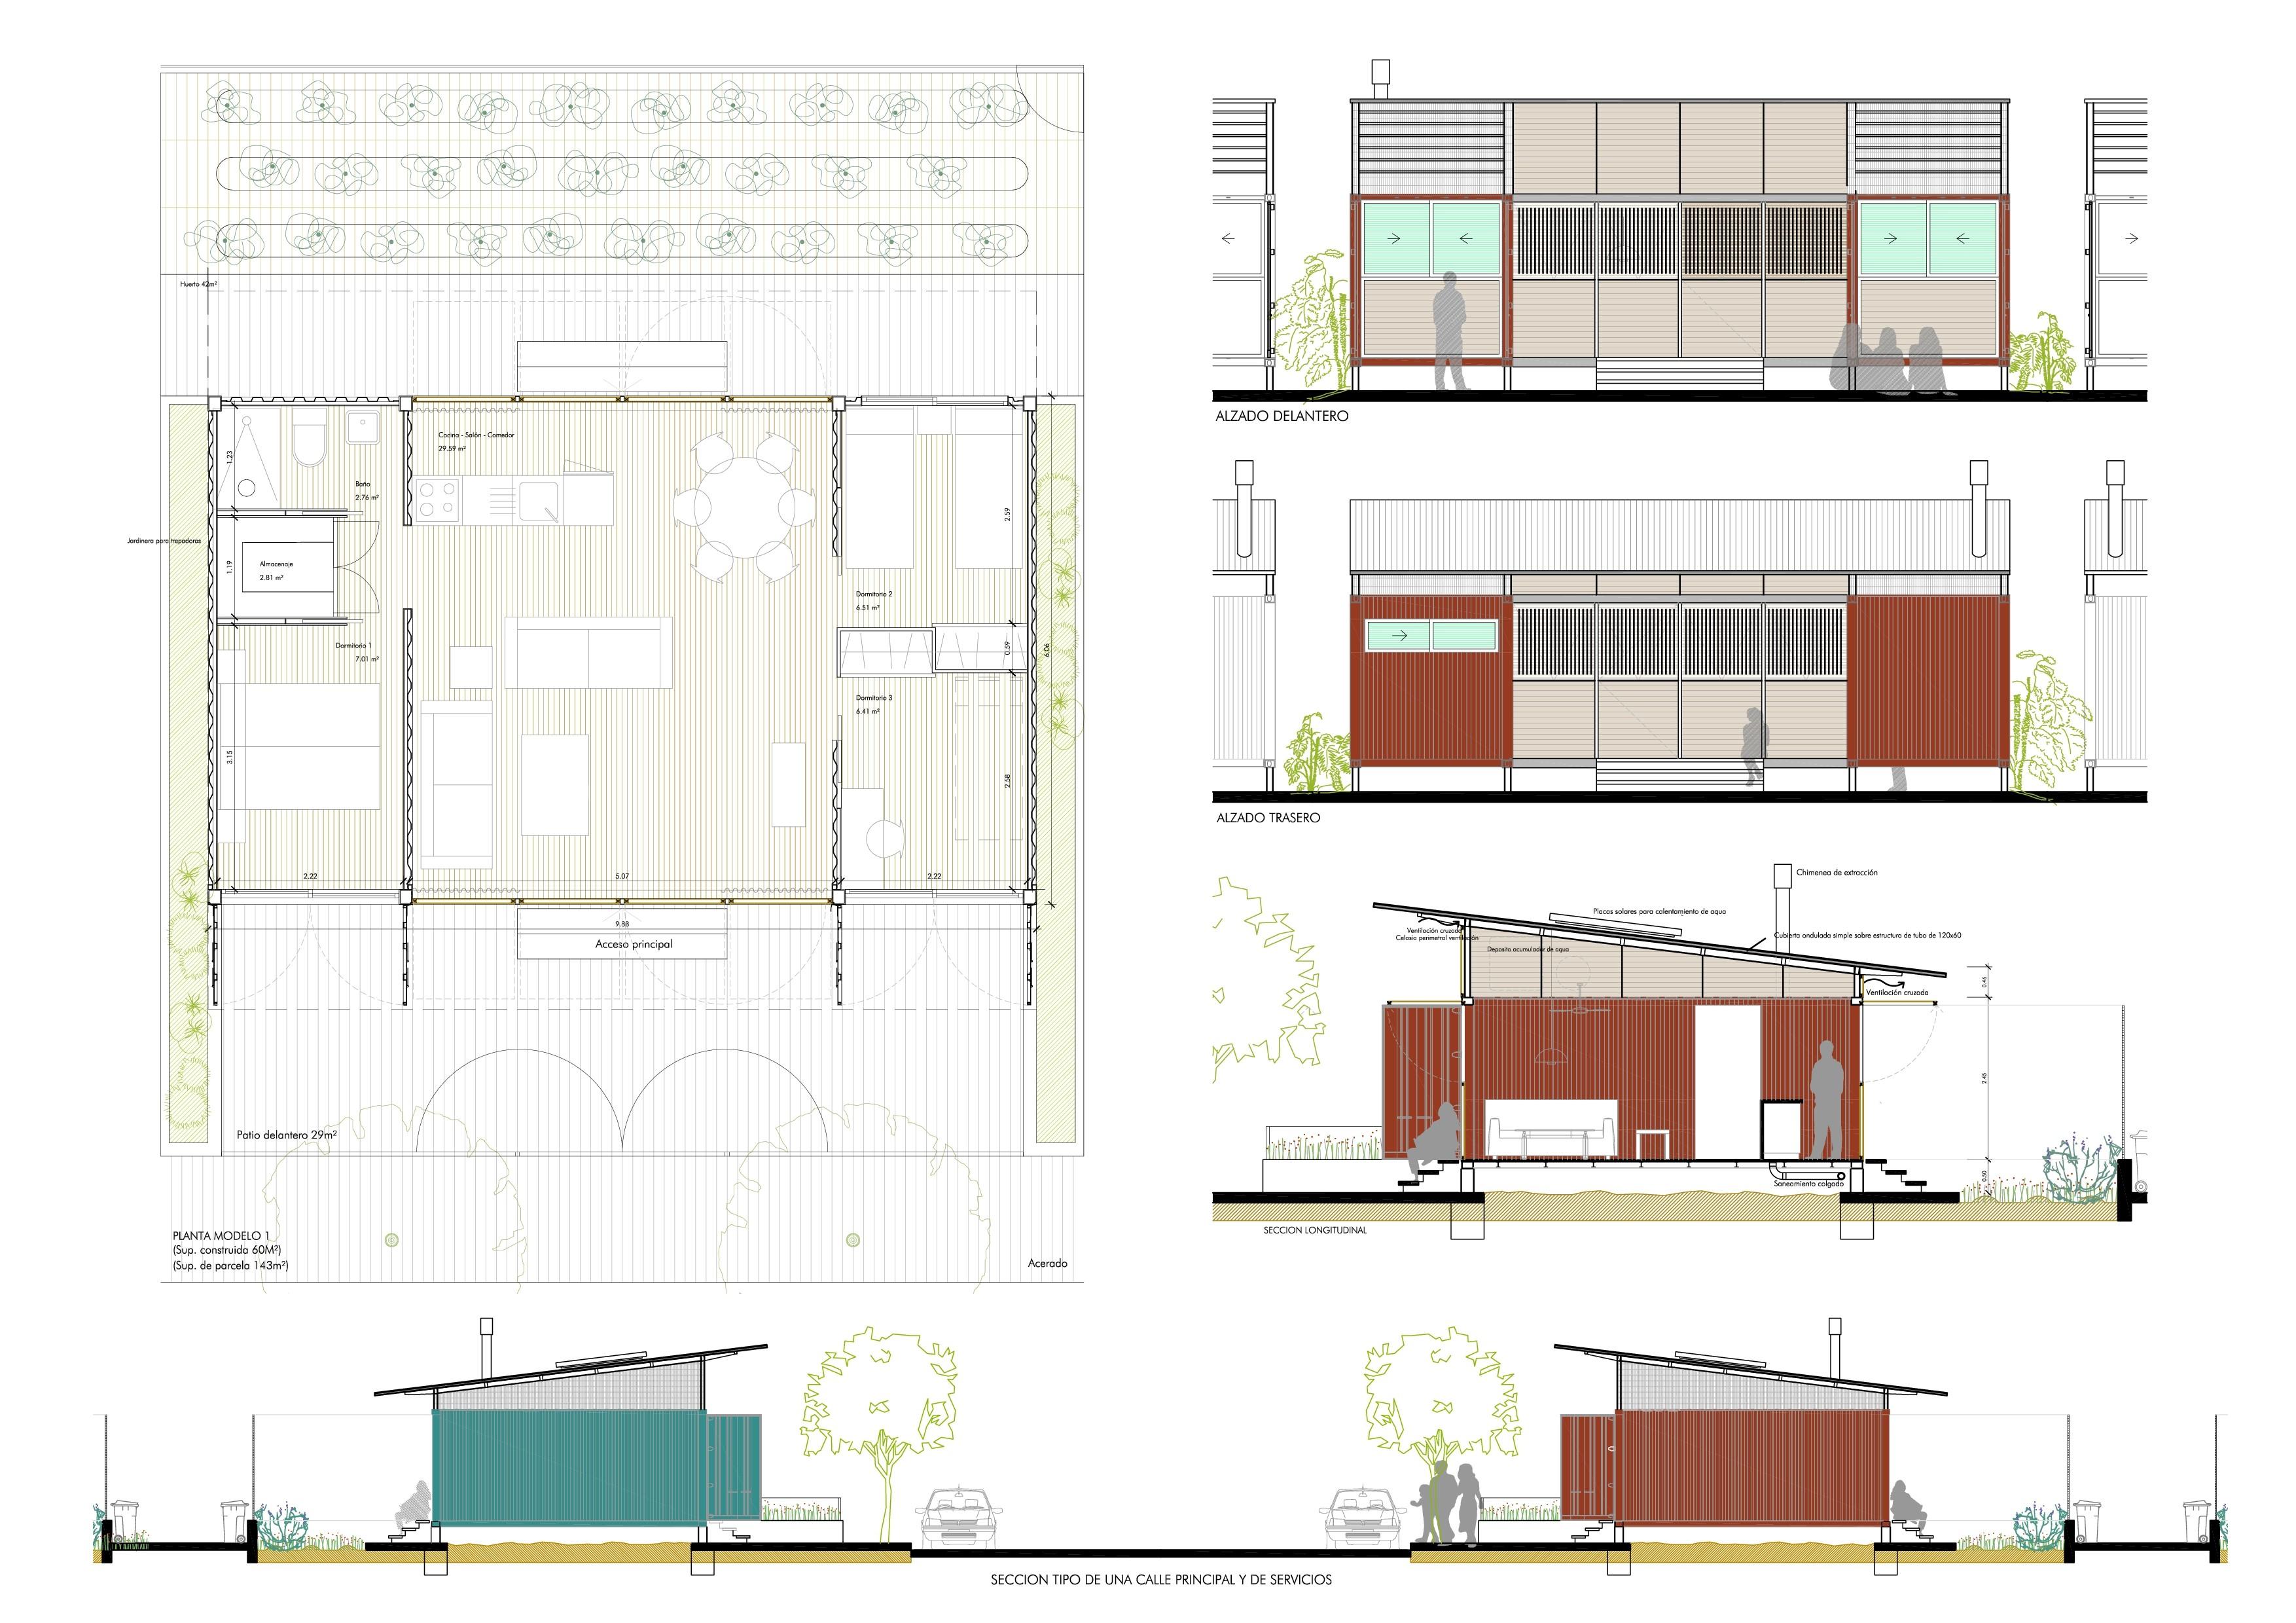 Modulos prefabricados vivienda patio 2 12 vivienda - Modulos prefabricados para viviendas ...